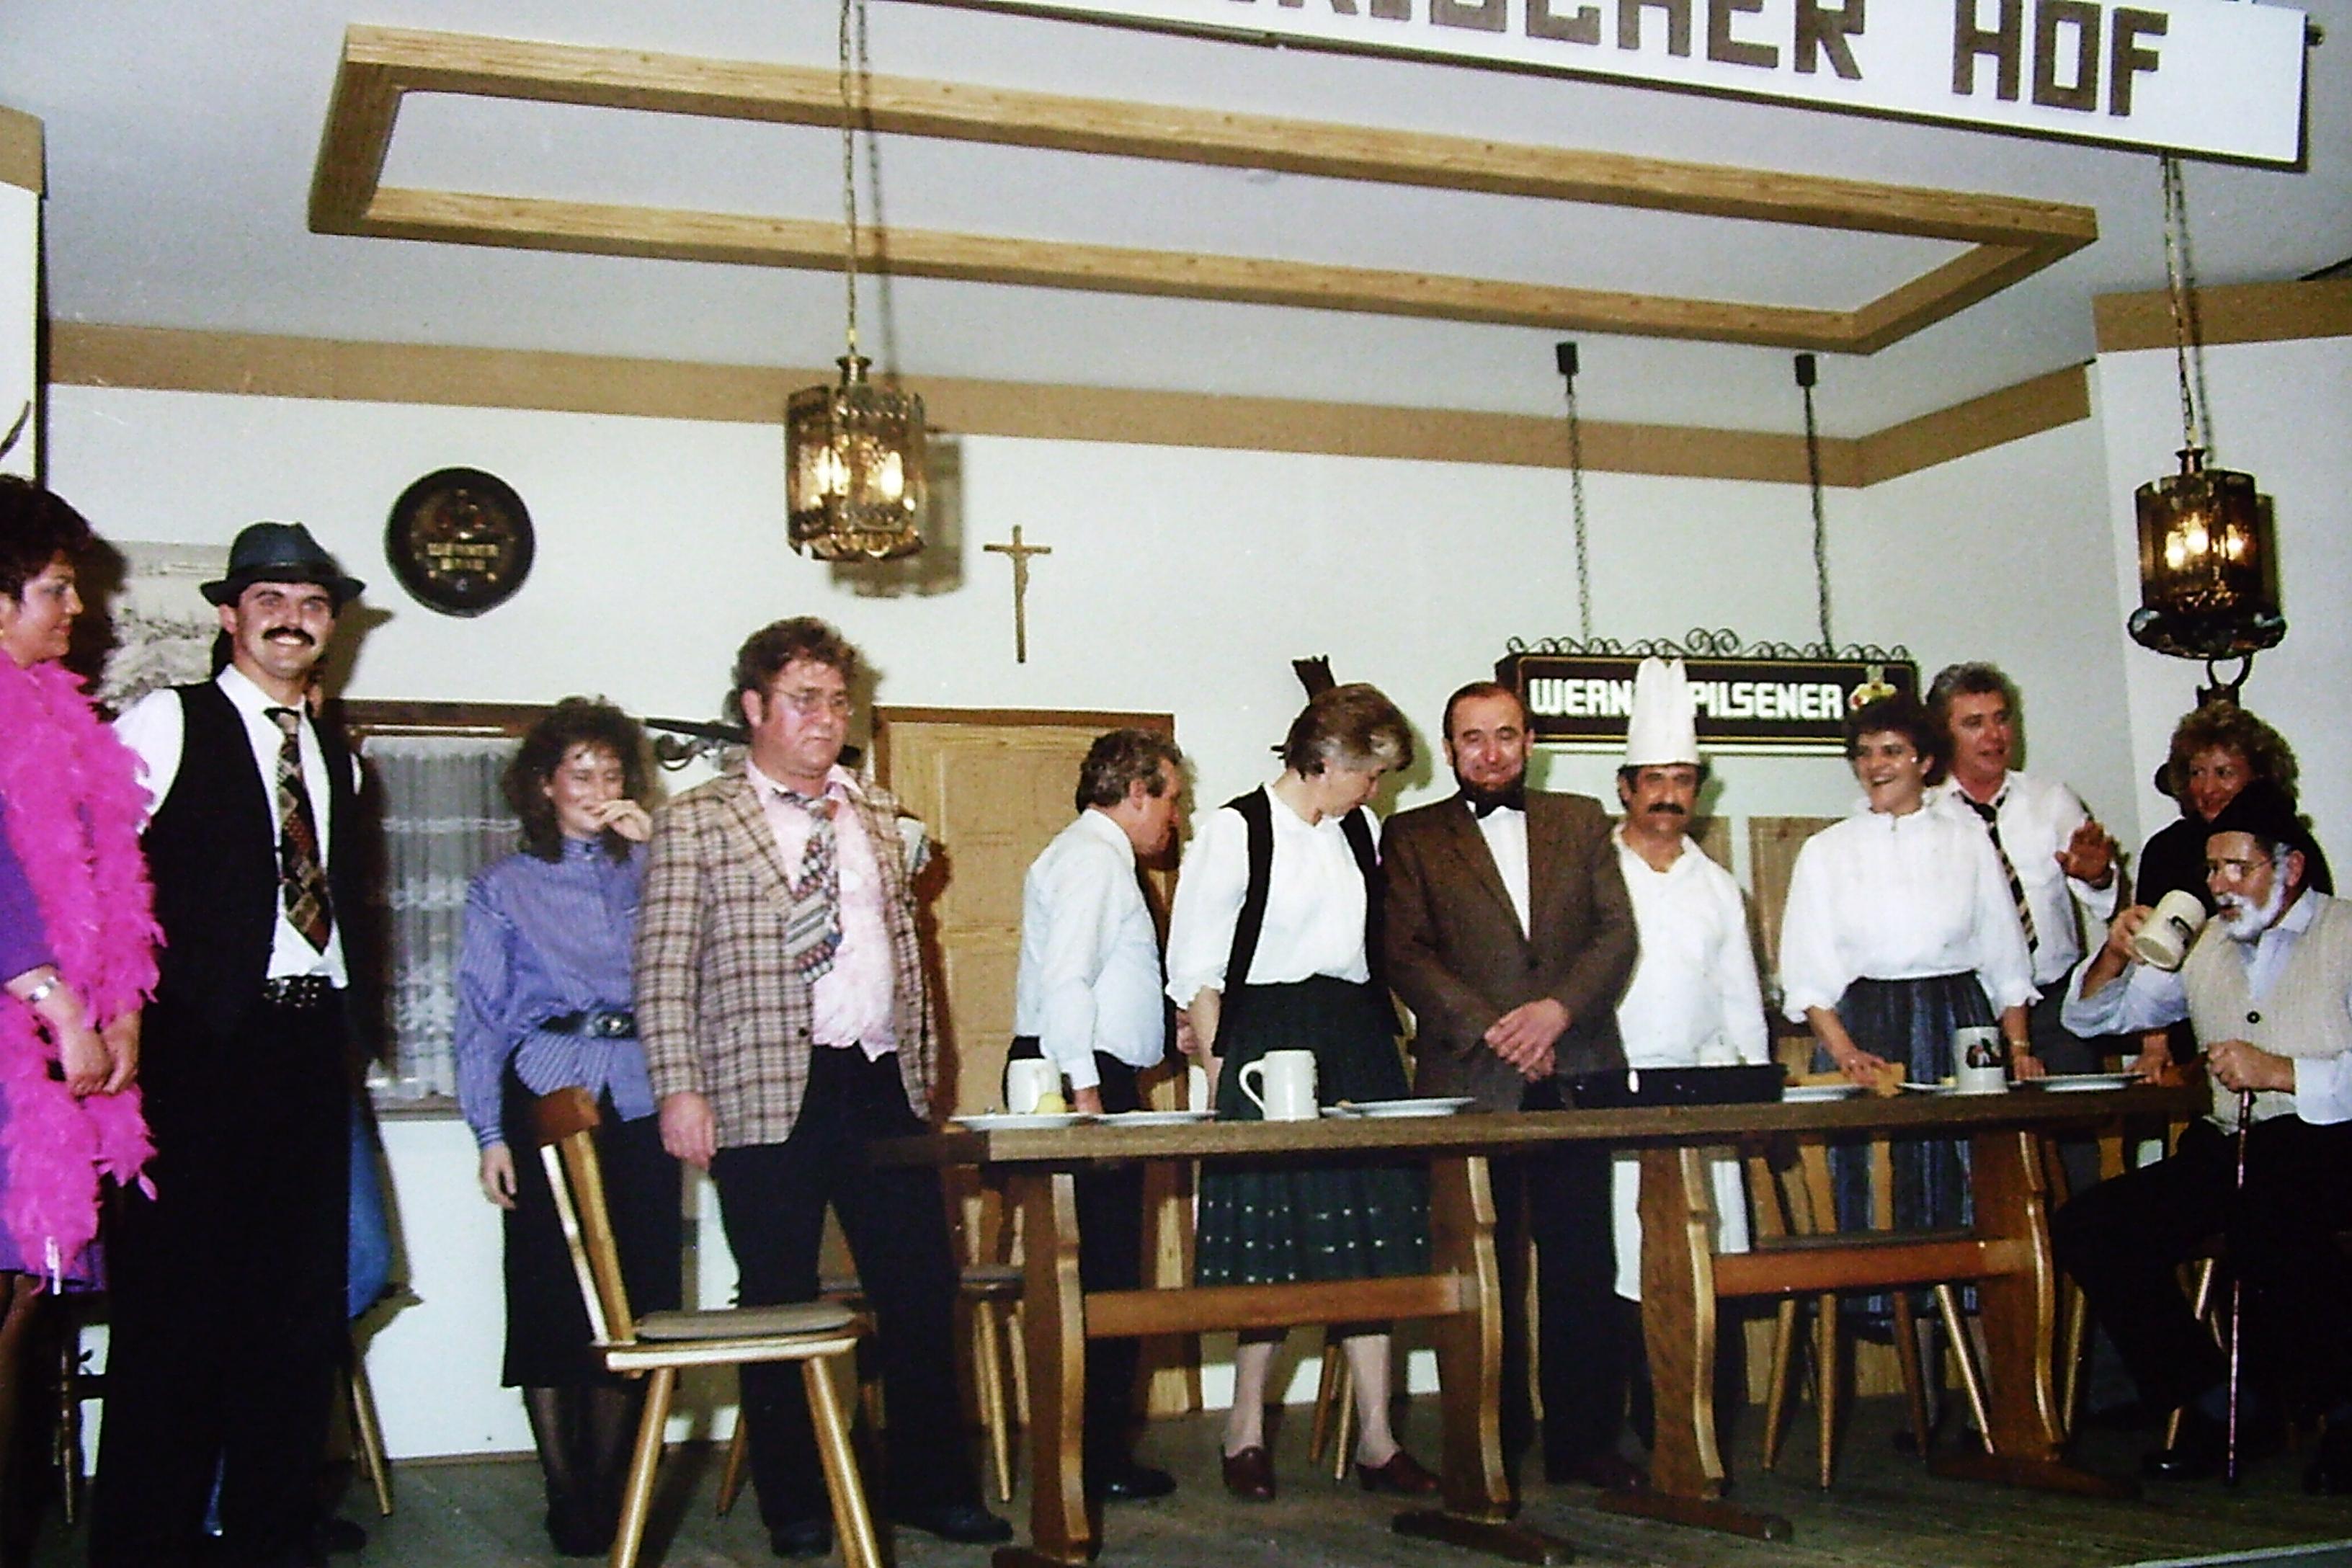 1988 Pizza a la Oerlenbach 001